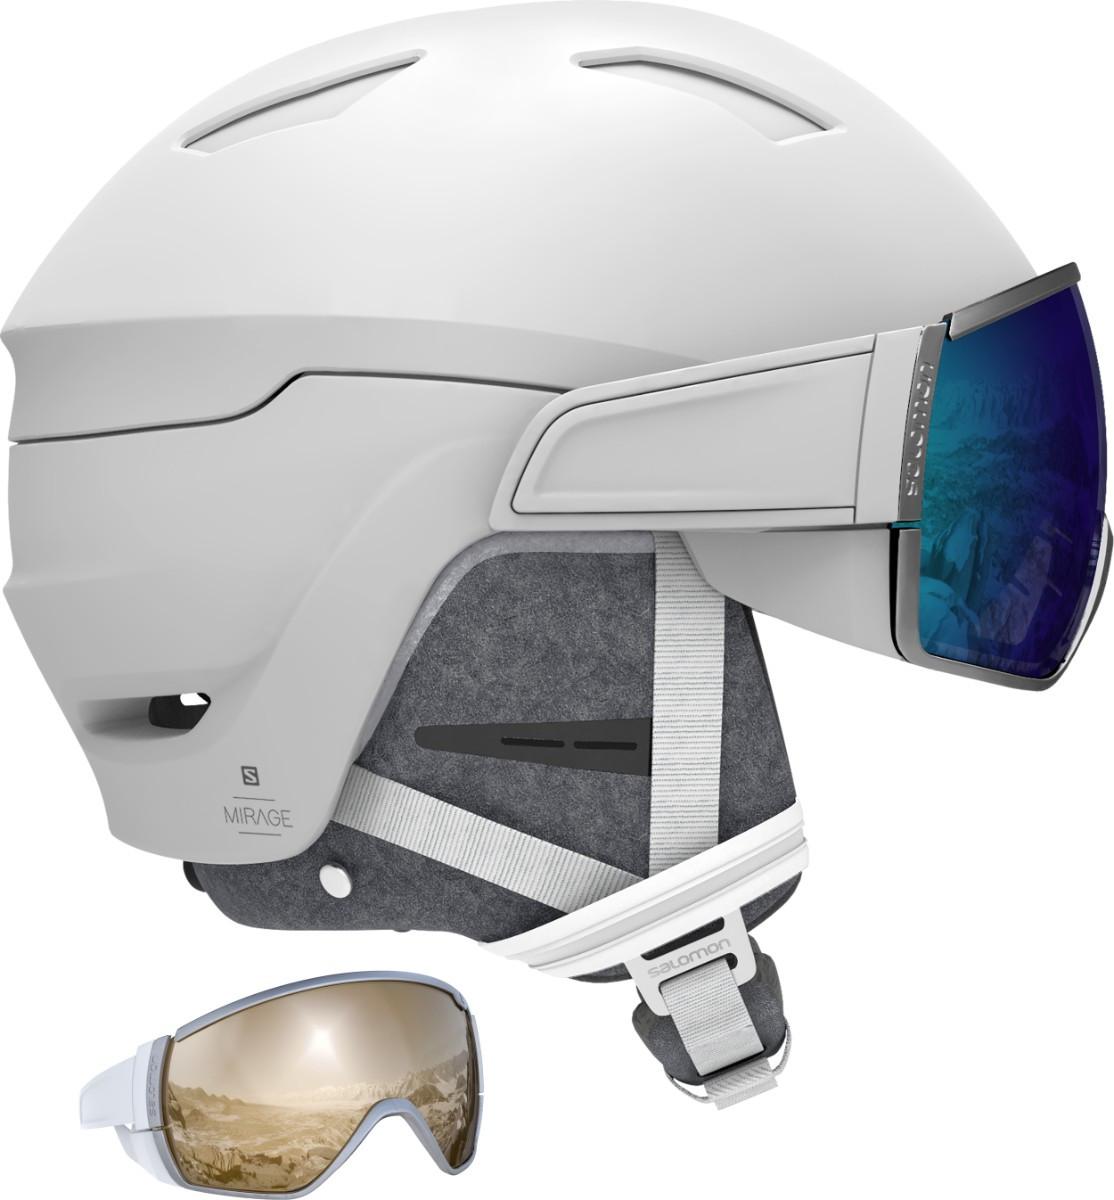 Salomon Mirage+ Velikost helmy: S 2019/2020